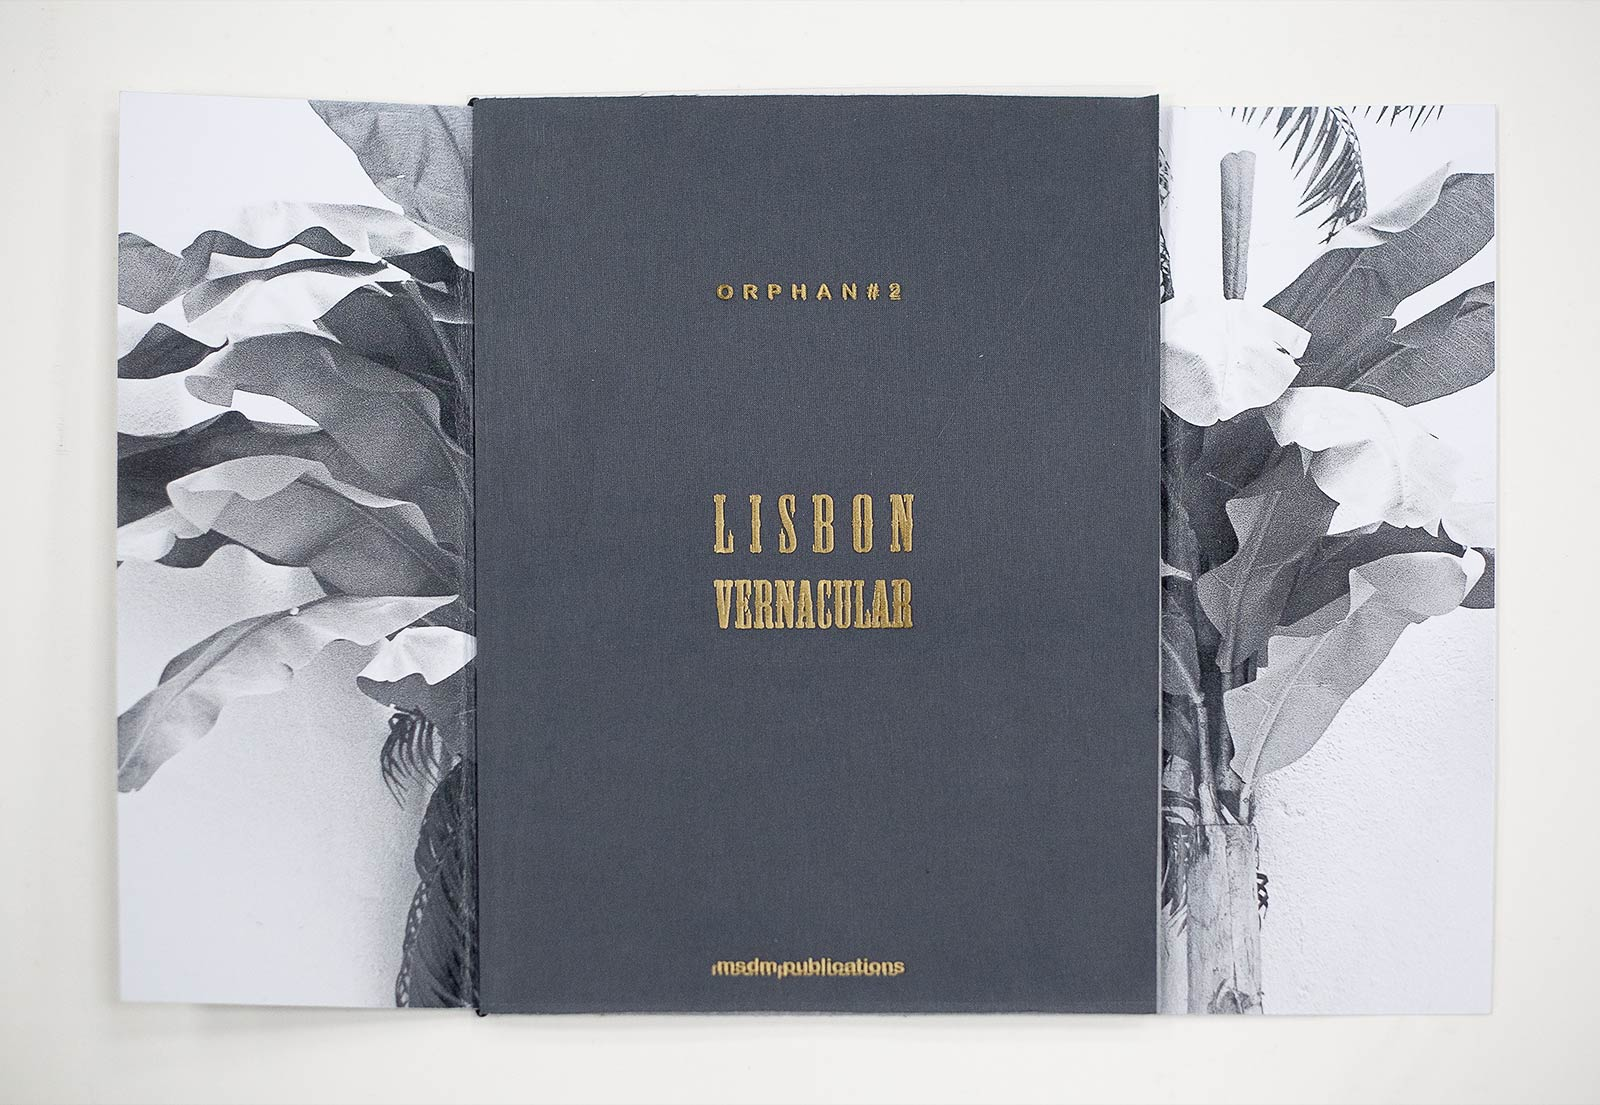 paula-roush-lisbon-vernacular-23